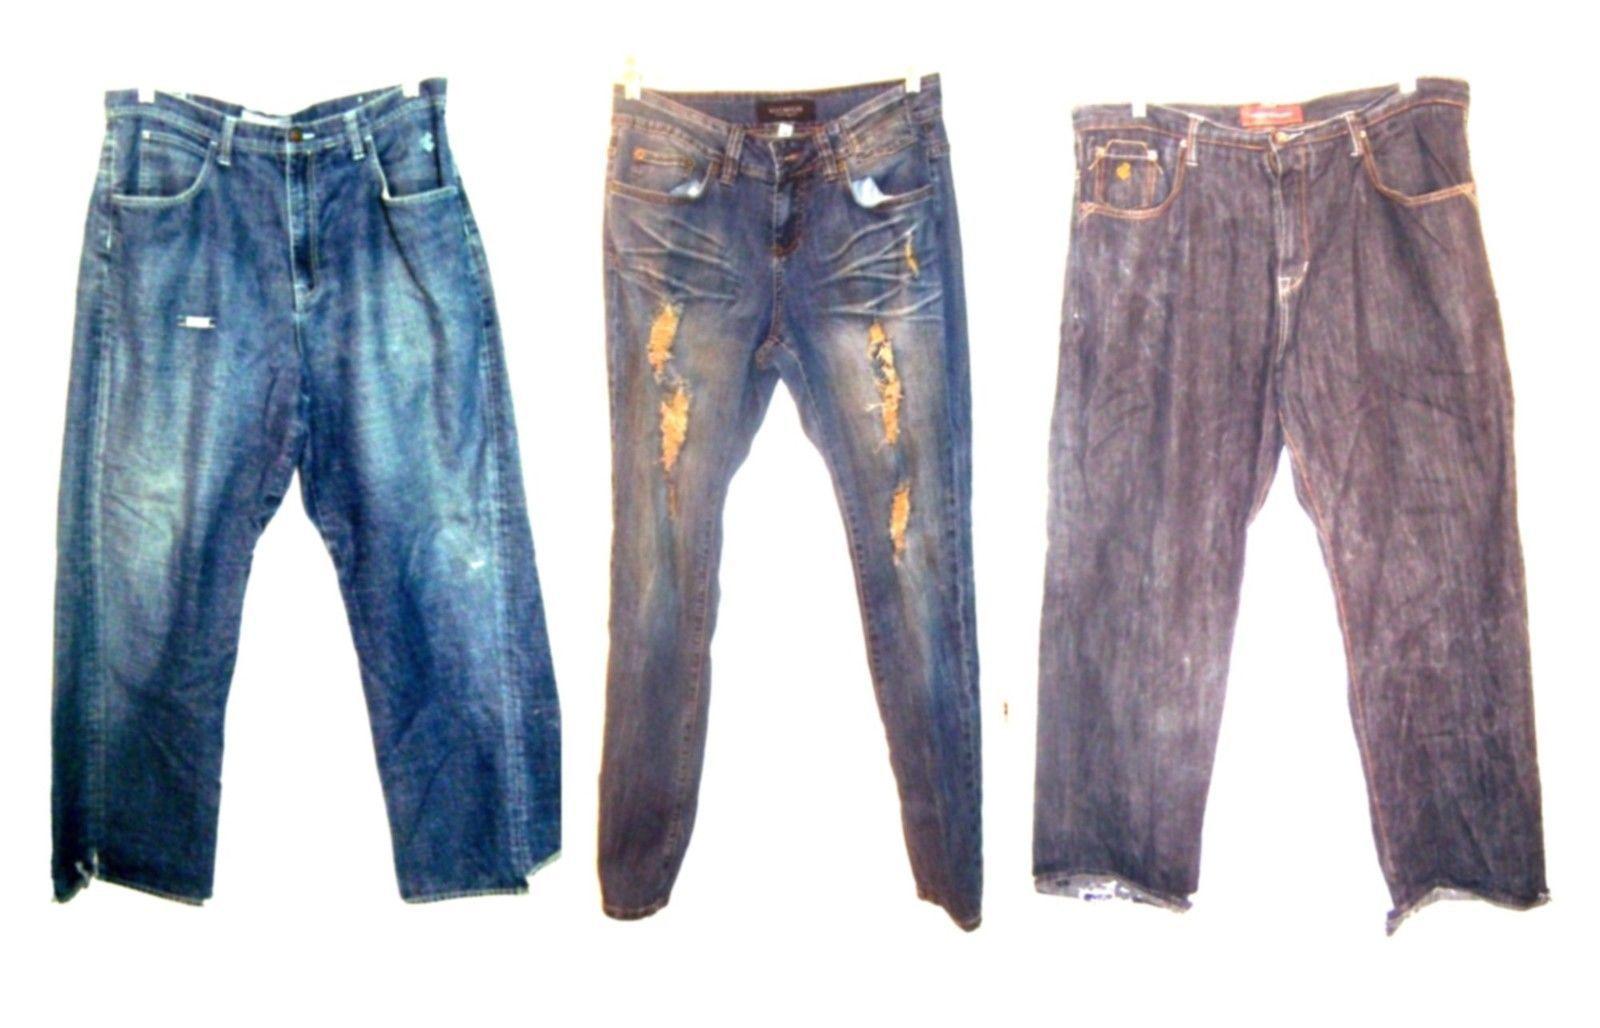 Rocawear Blue Jean Denim Distressed Jeans Pants Sizes 14 - 40 - $22.49